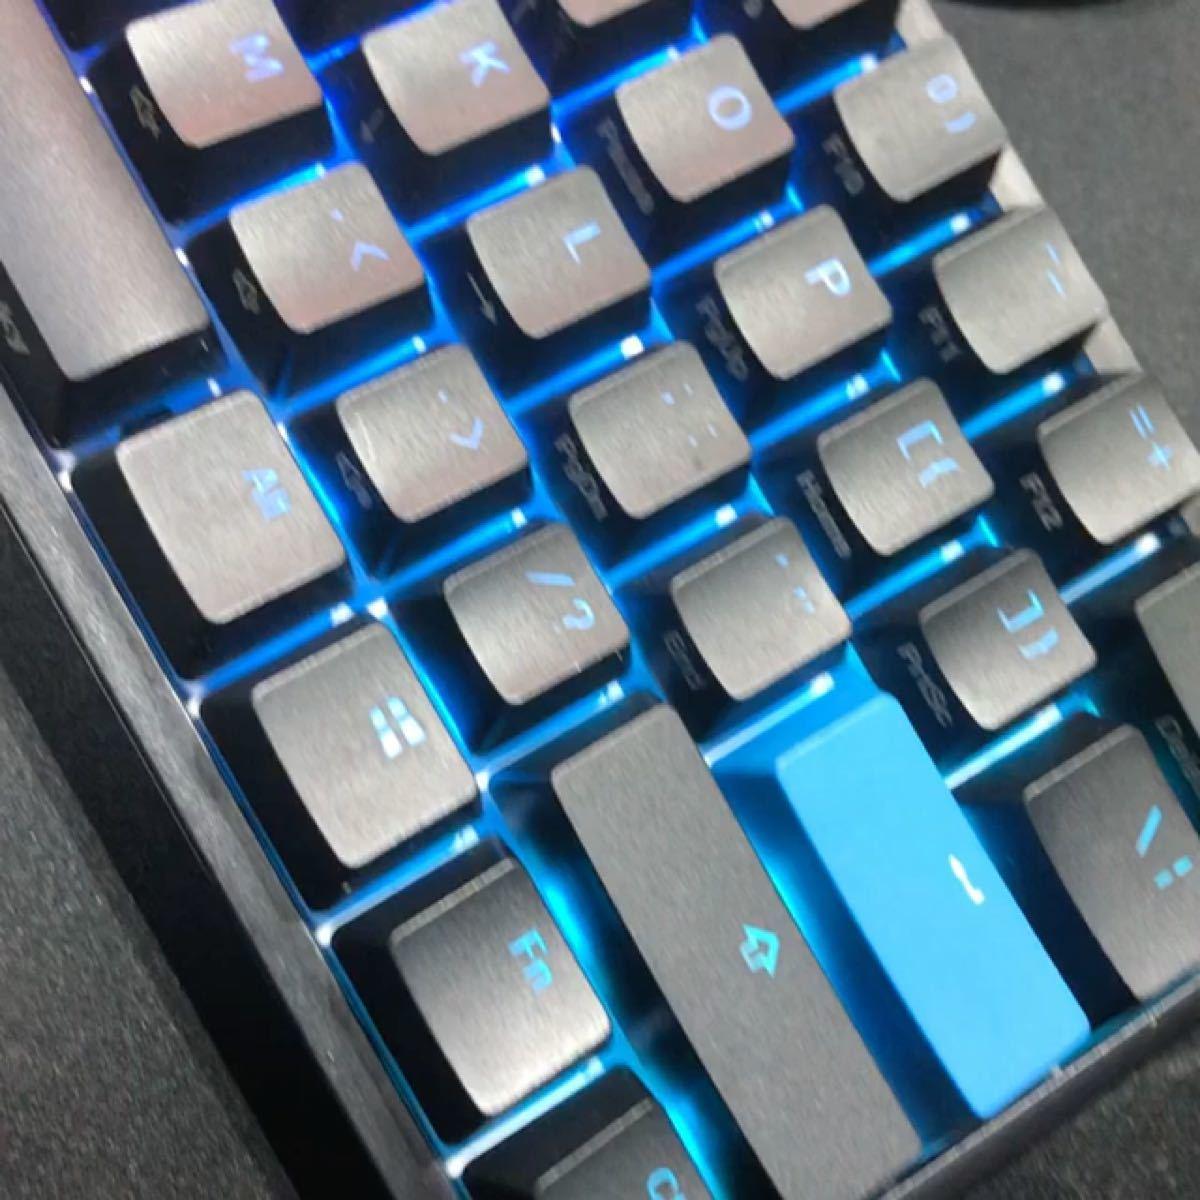 DUCKY ONE2 MINI ゲーミングキーボード 青軸